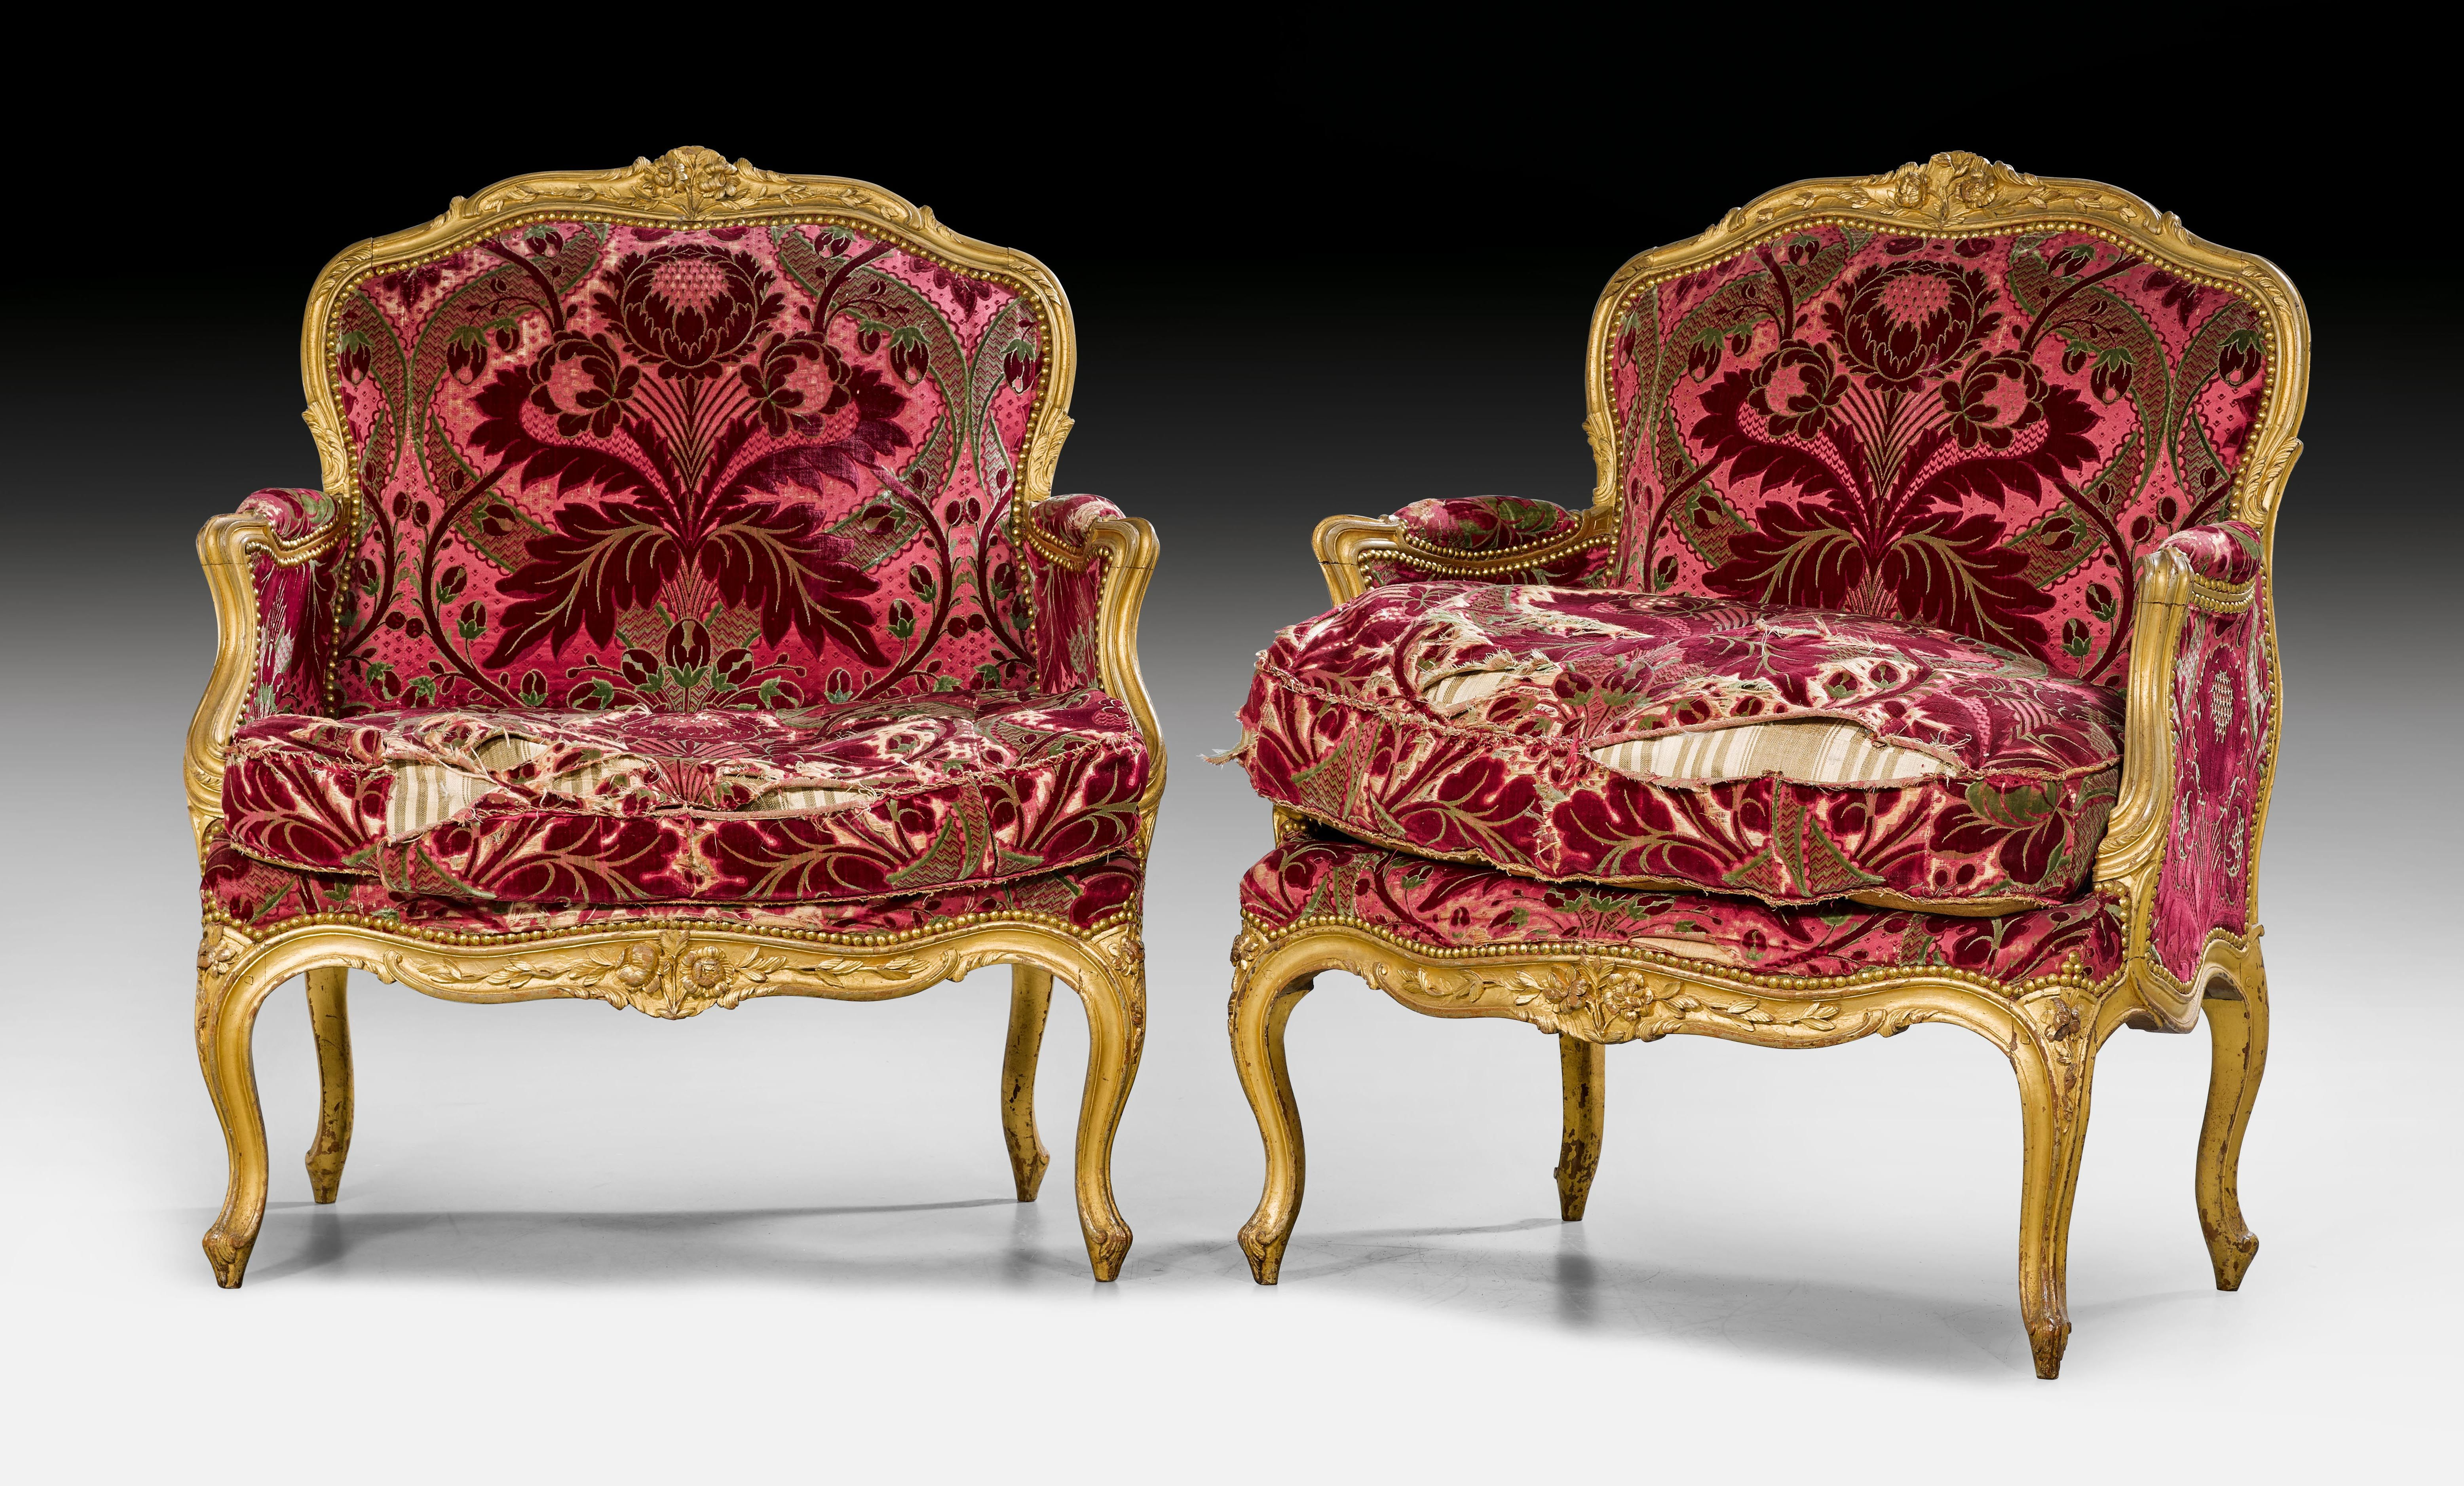 C1755 60 Pair Of Marquise Fauteuils Louis Xv Attributable To J B Boulard Jean Baptiste Boulard Maitre 1754 Paris Ca 1755 Louis Xv Louis Easy Chair